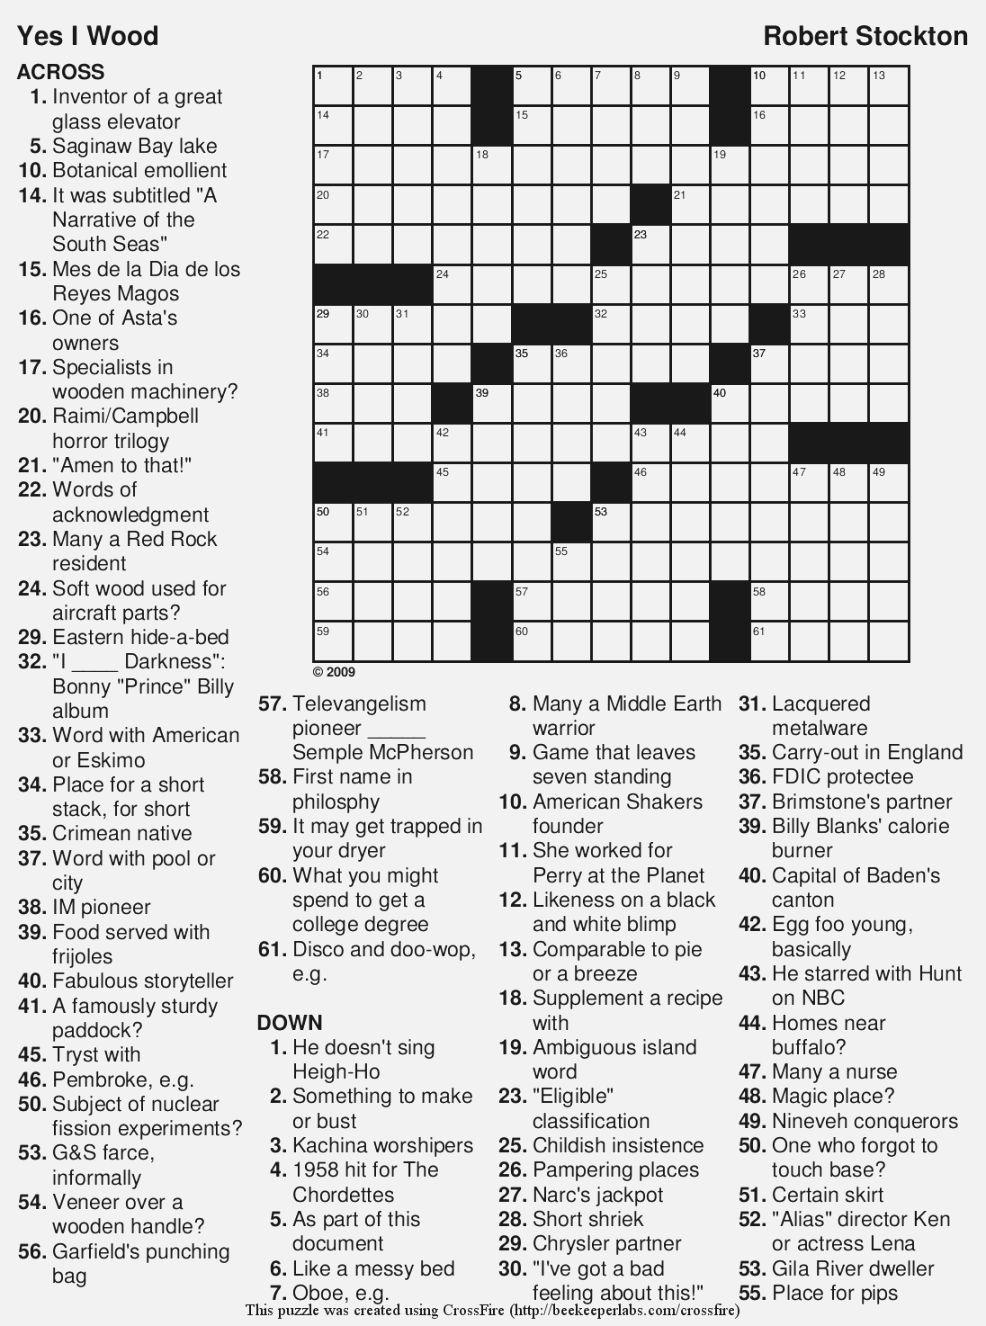 Large Print Puzzles For Seniors | M3U8 - Printable Crossword Puzzles Big